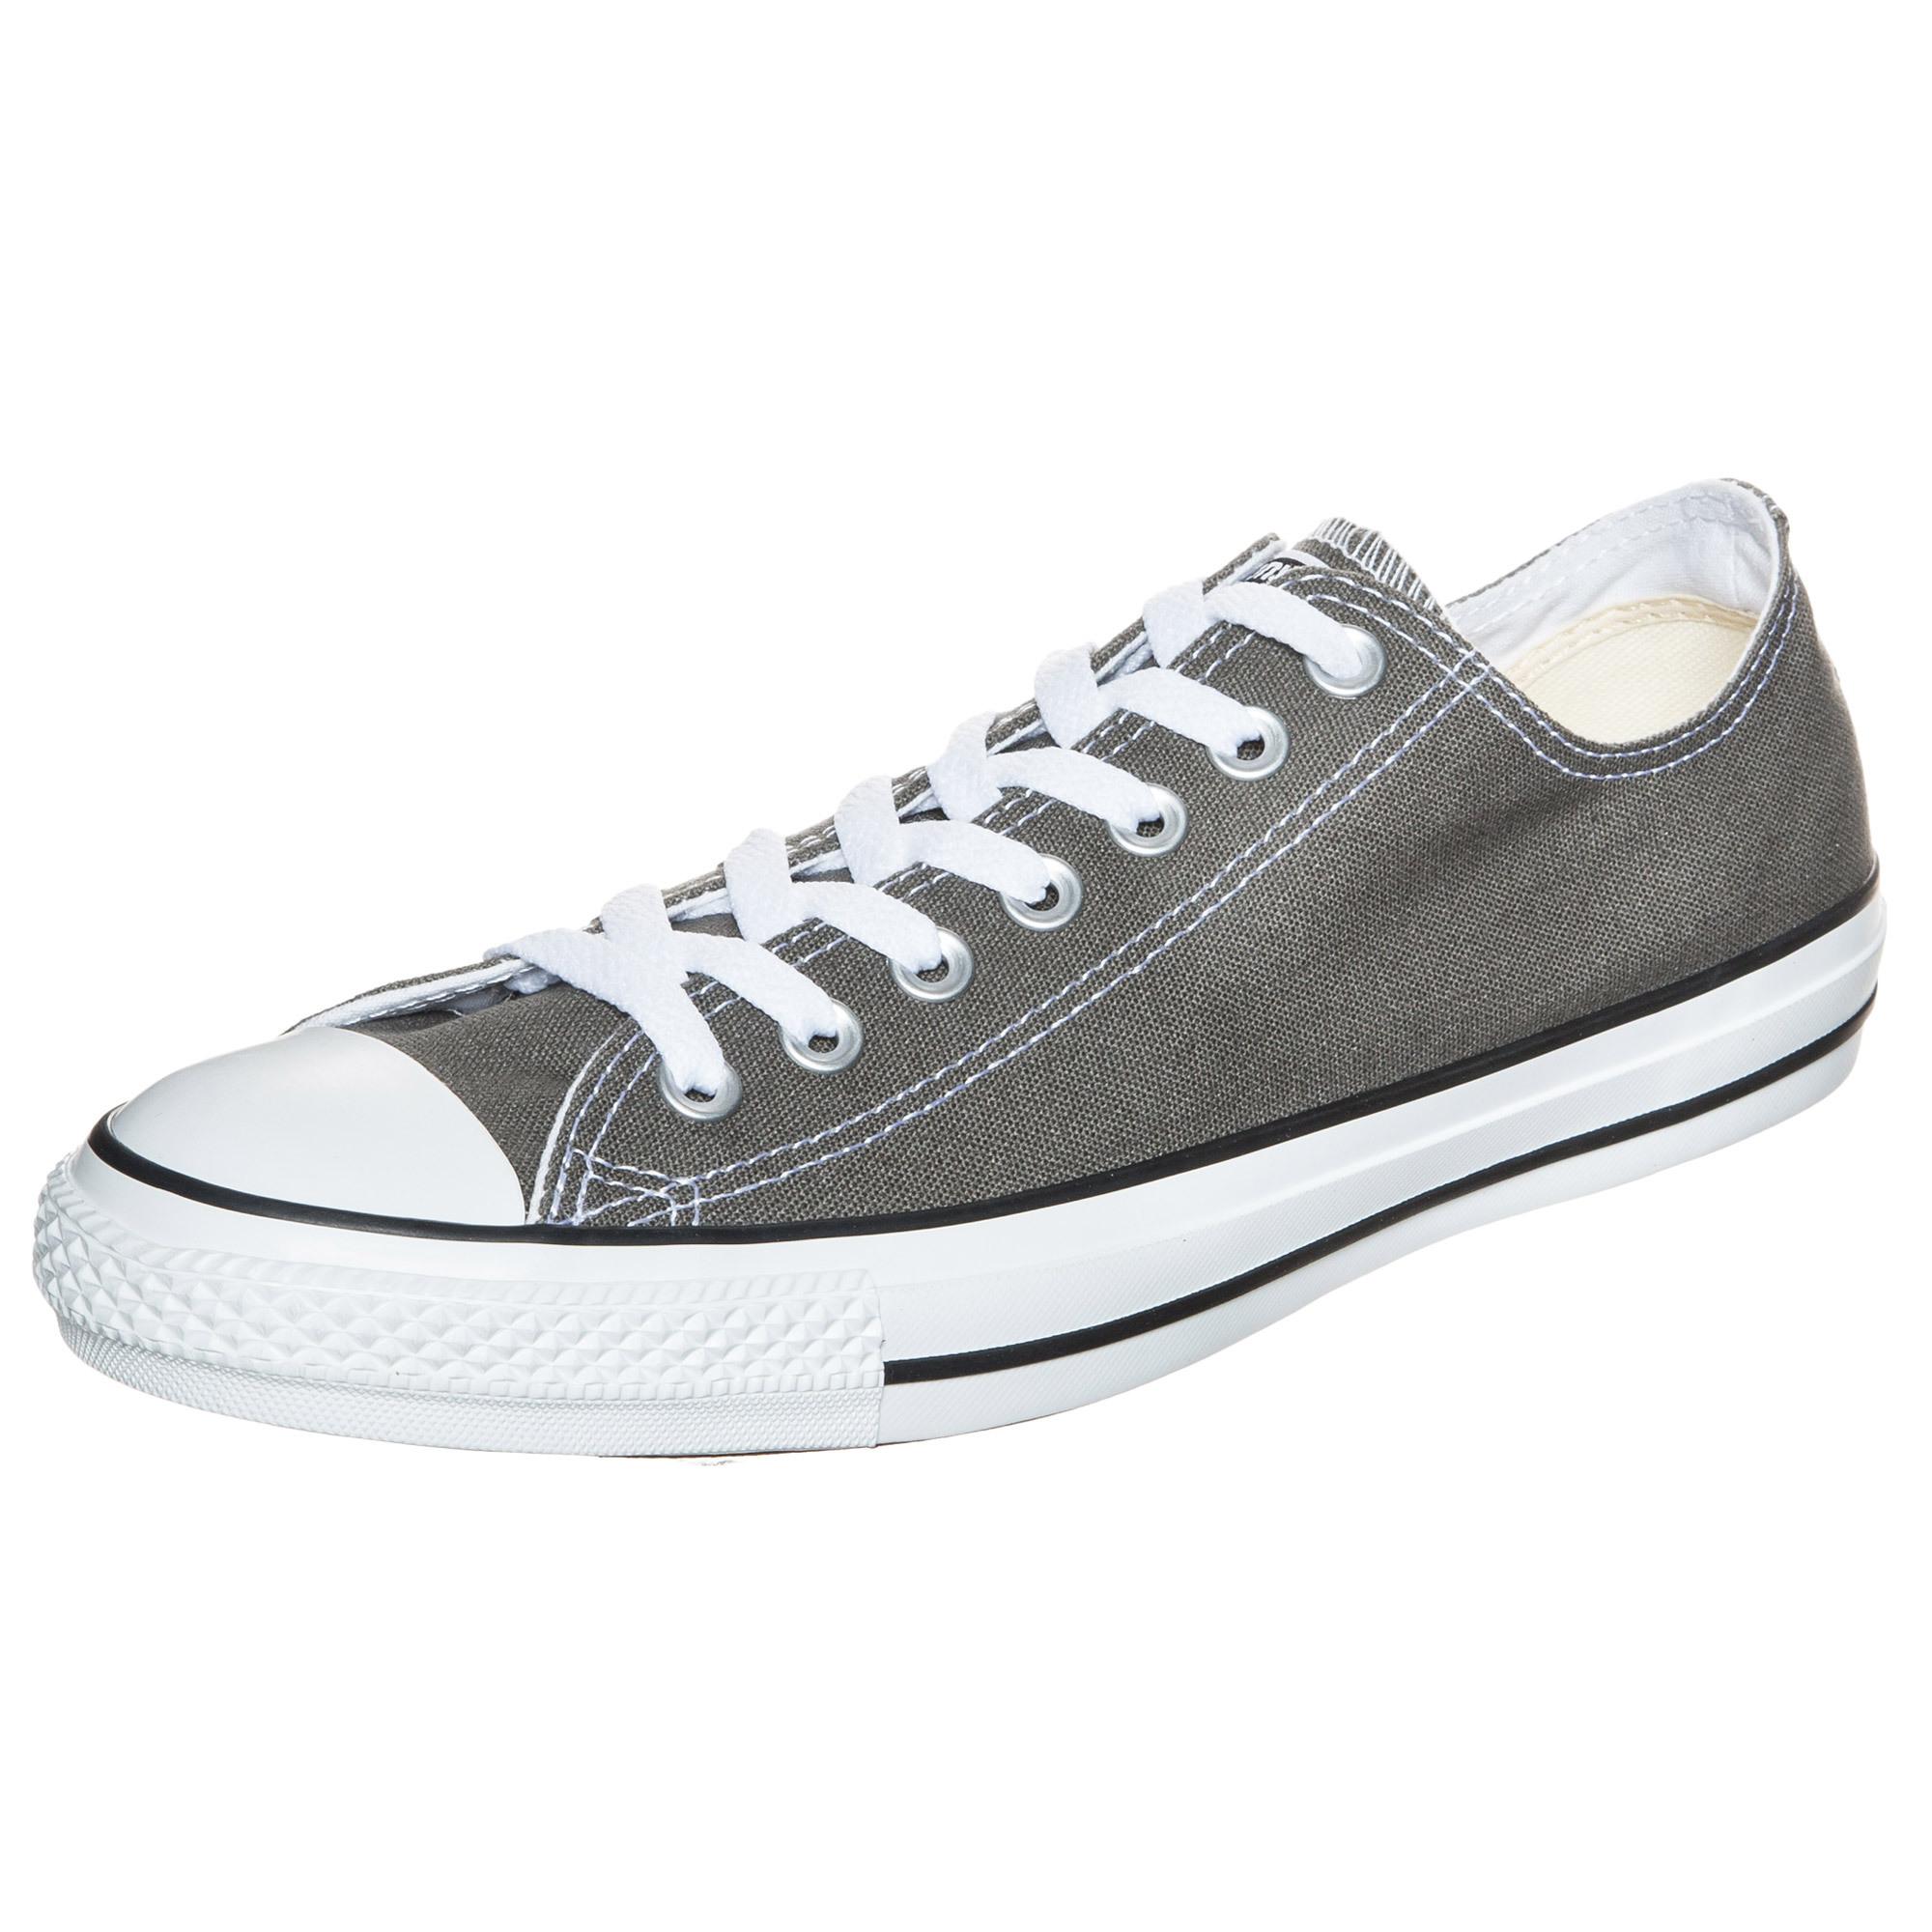 Converse Chuck Taylor All Star Seasonal OX Sneaker